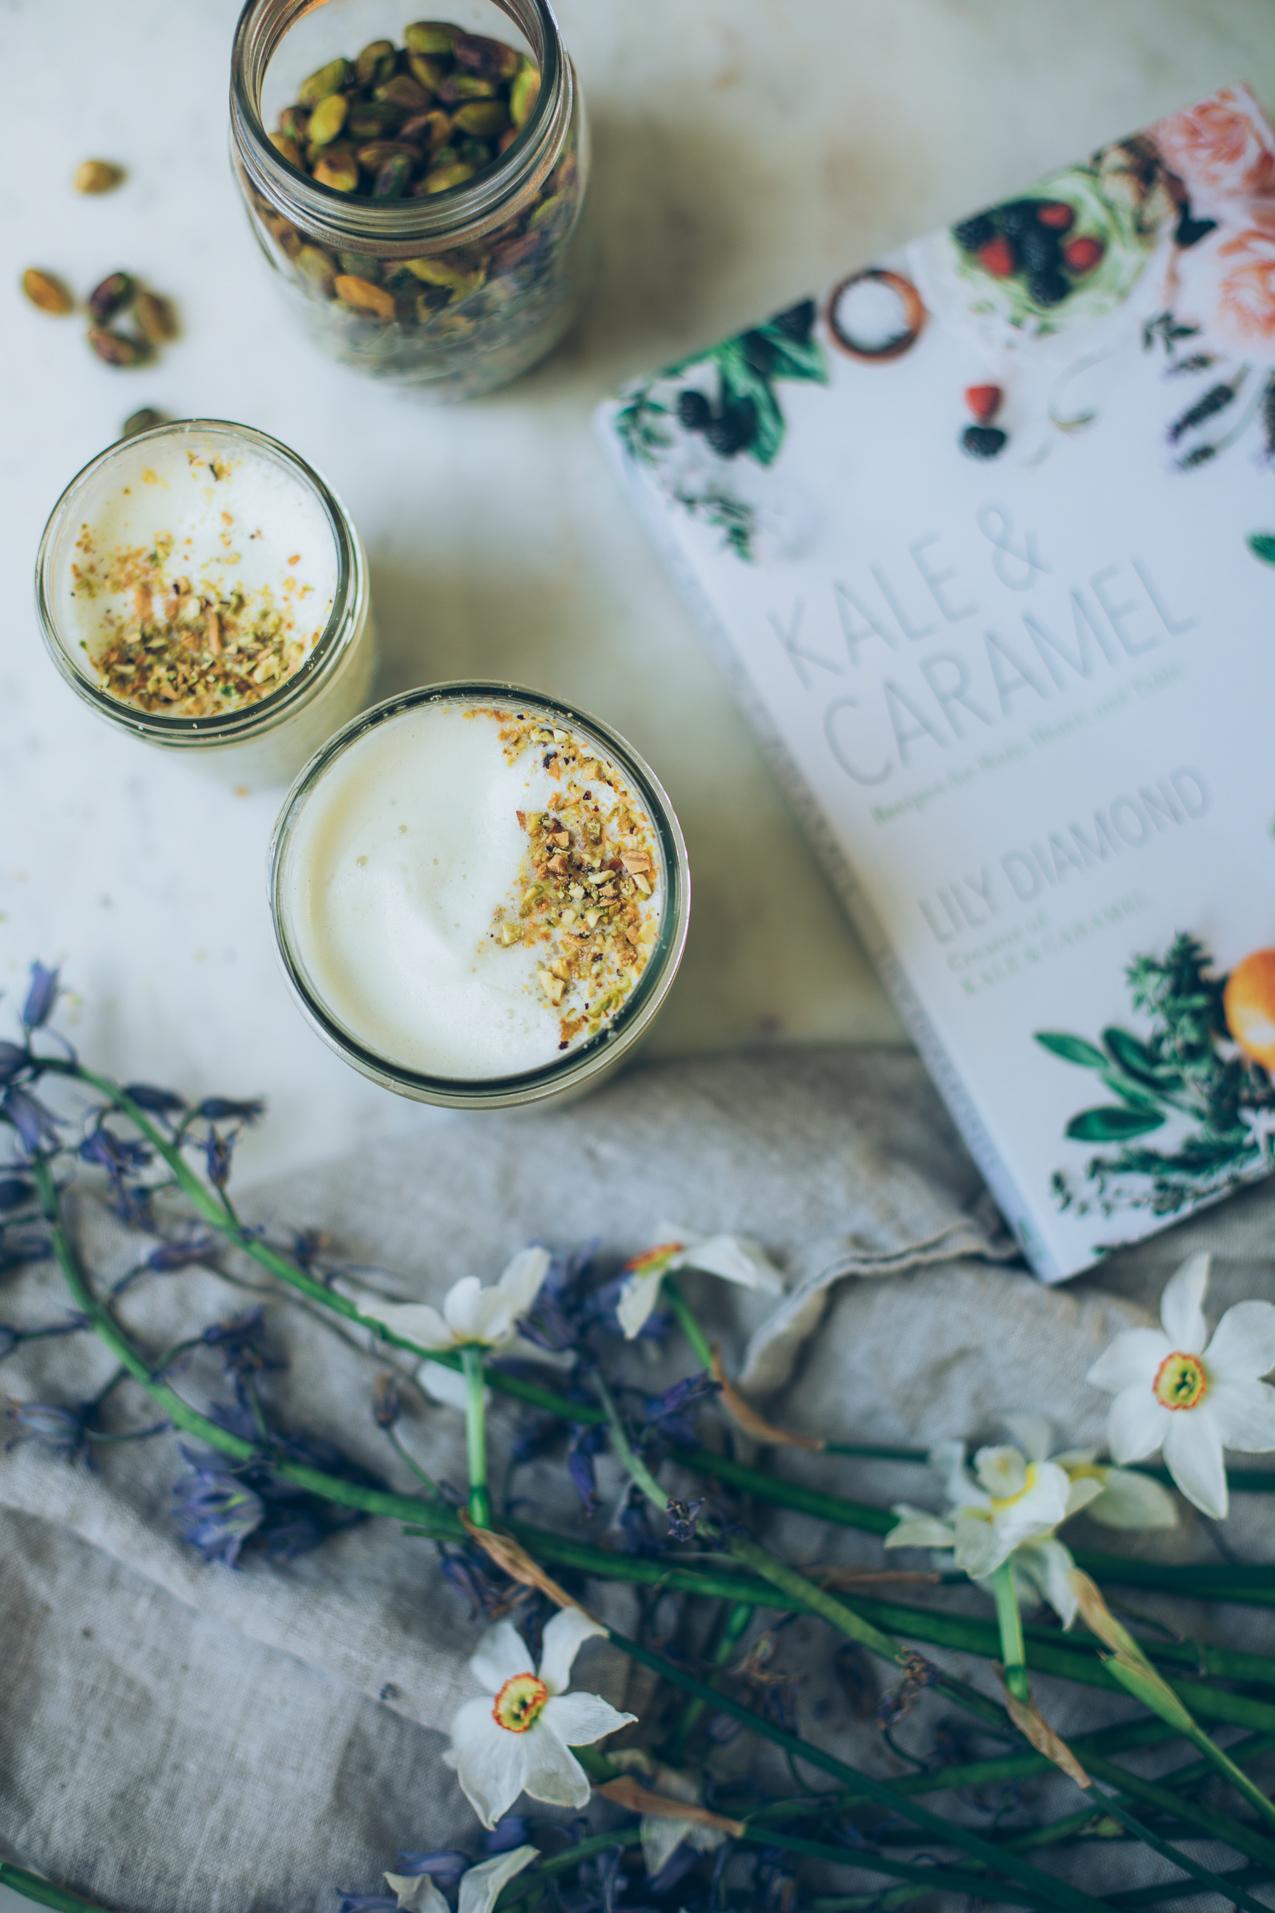 pistachio-milk-5760.jpg